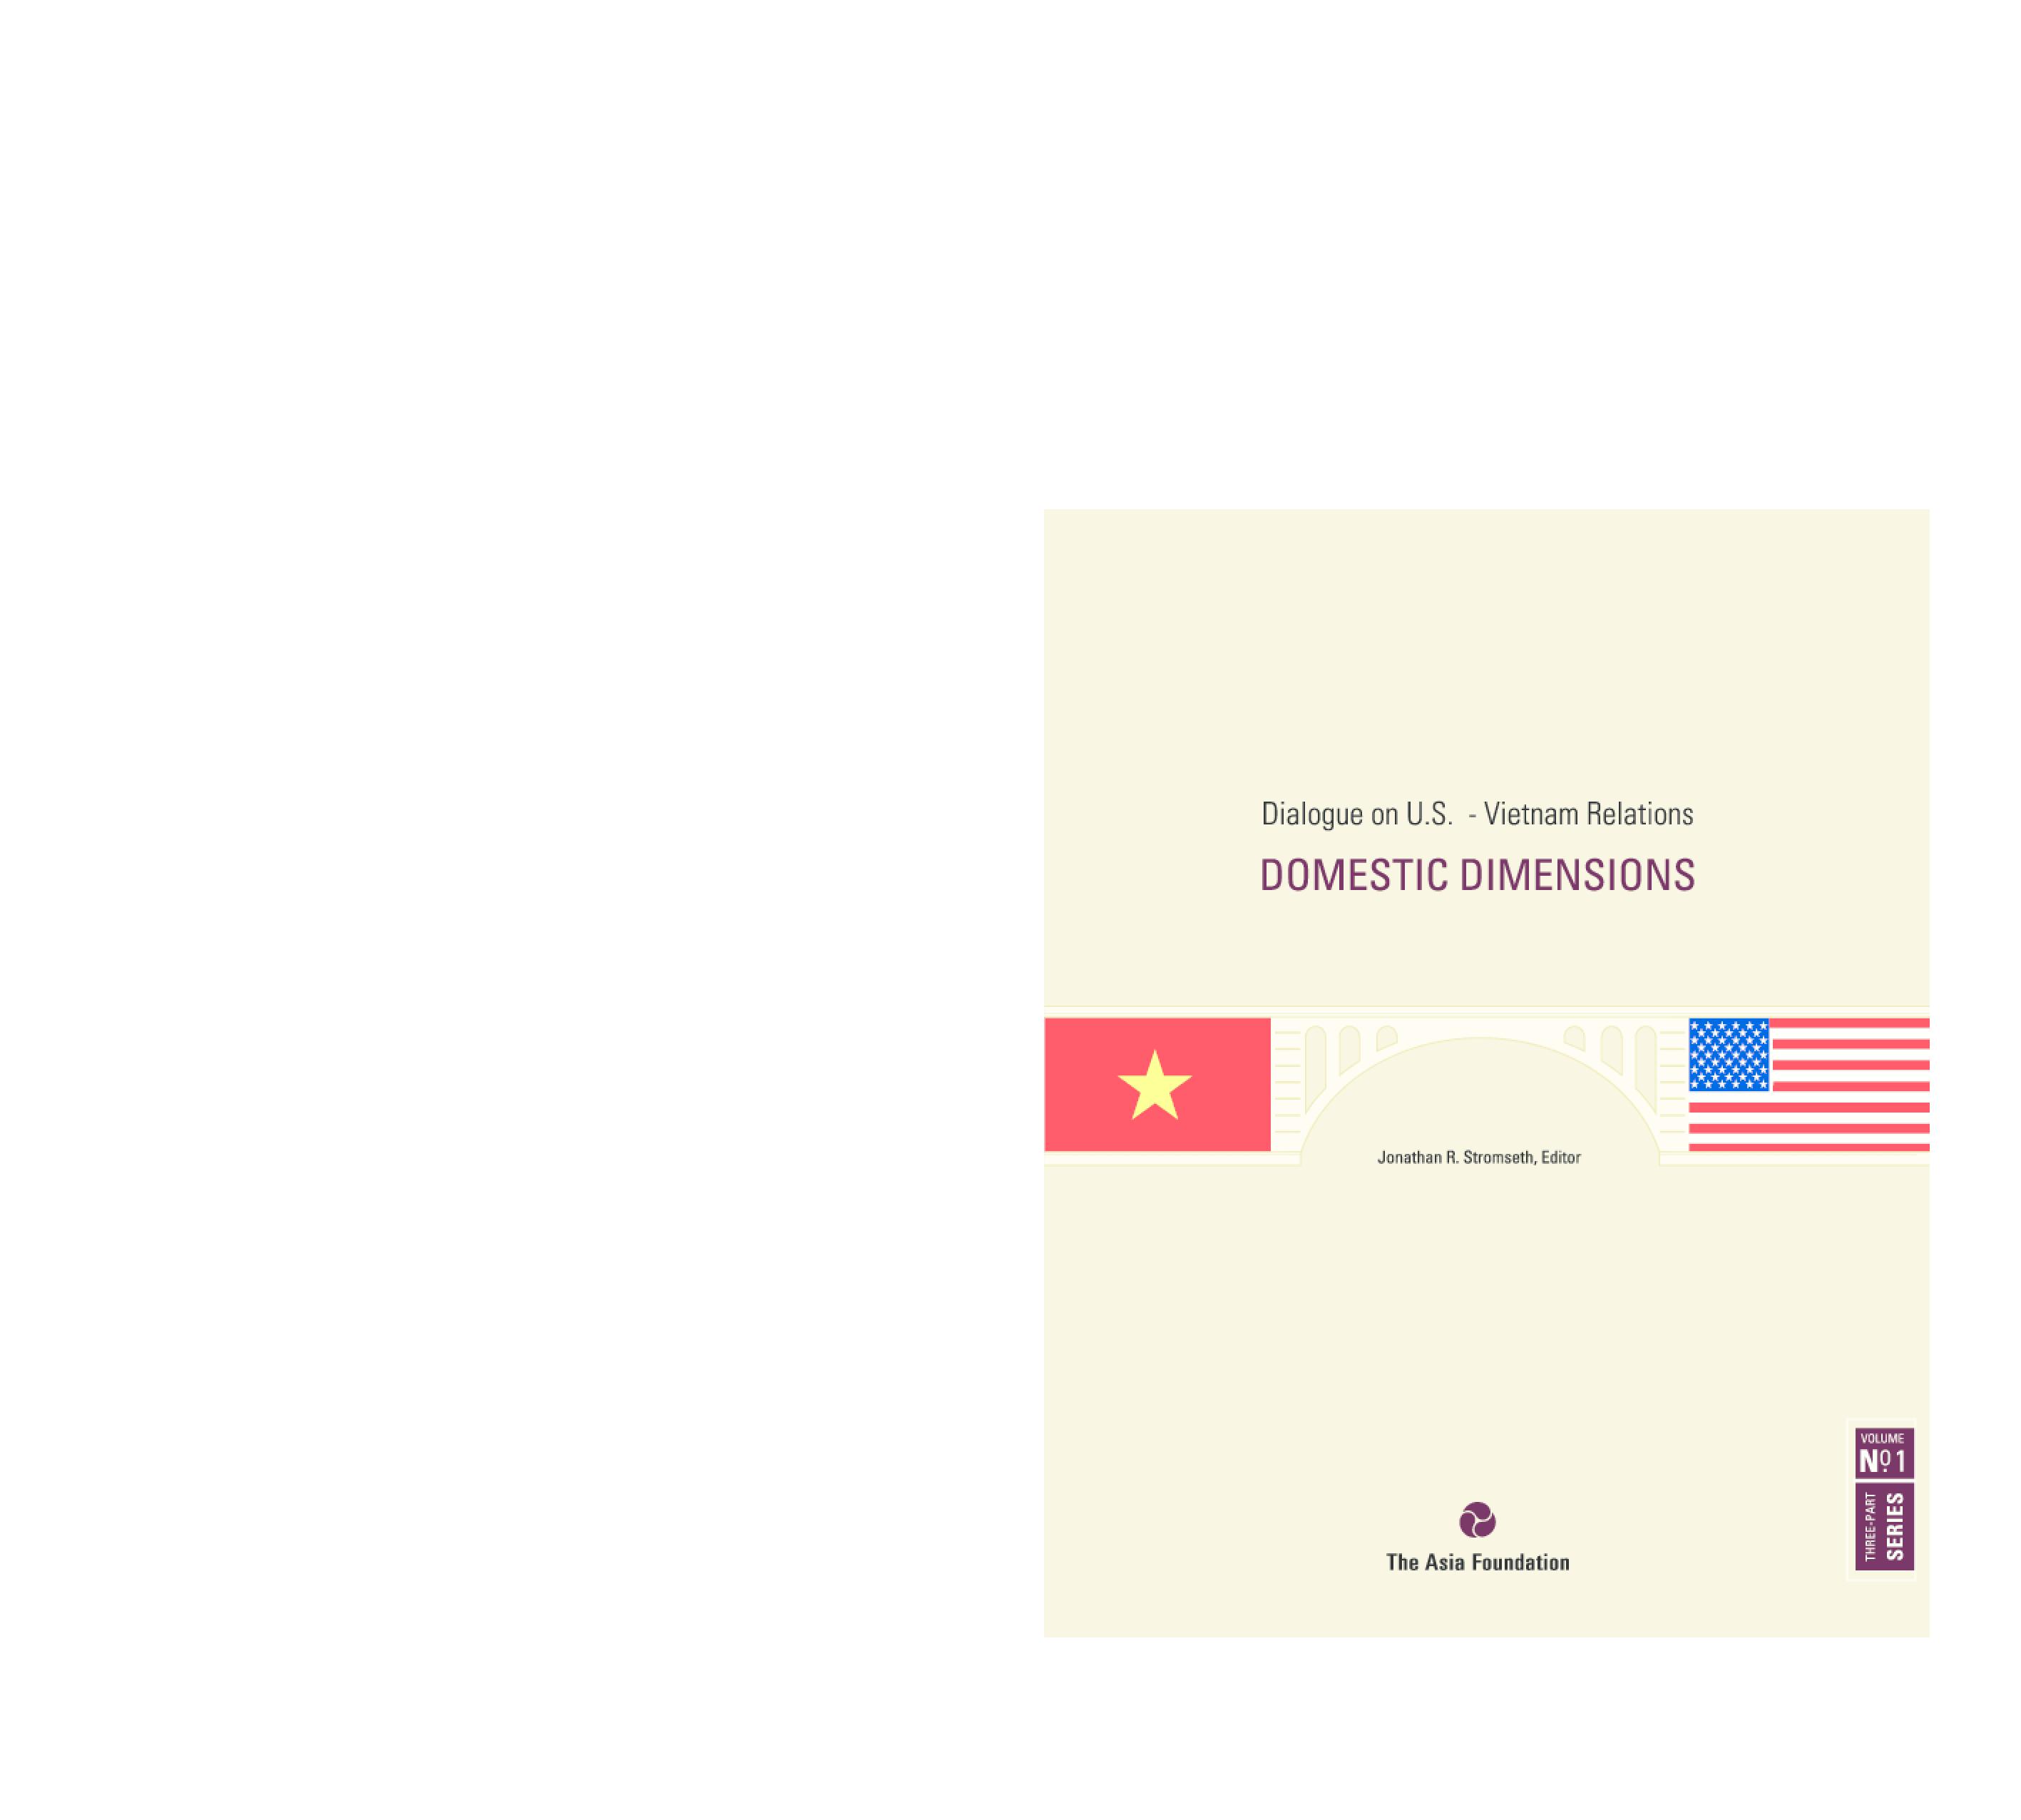 Dialogue on U.S. - Vietnam Relations: Domestic Dimensions